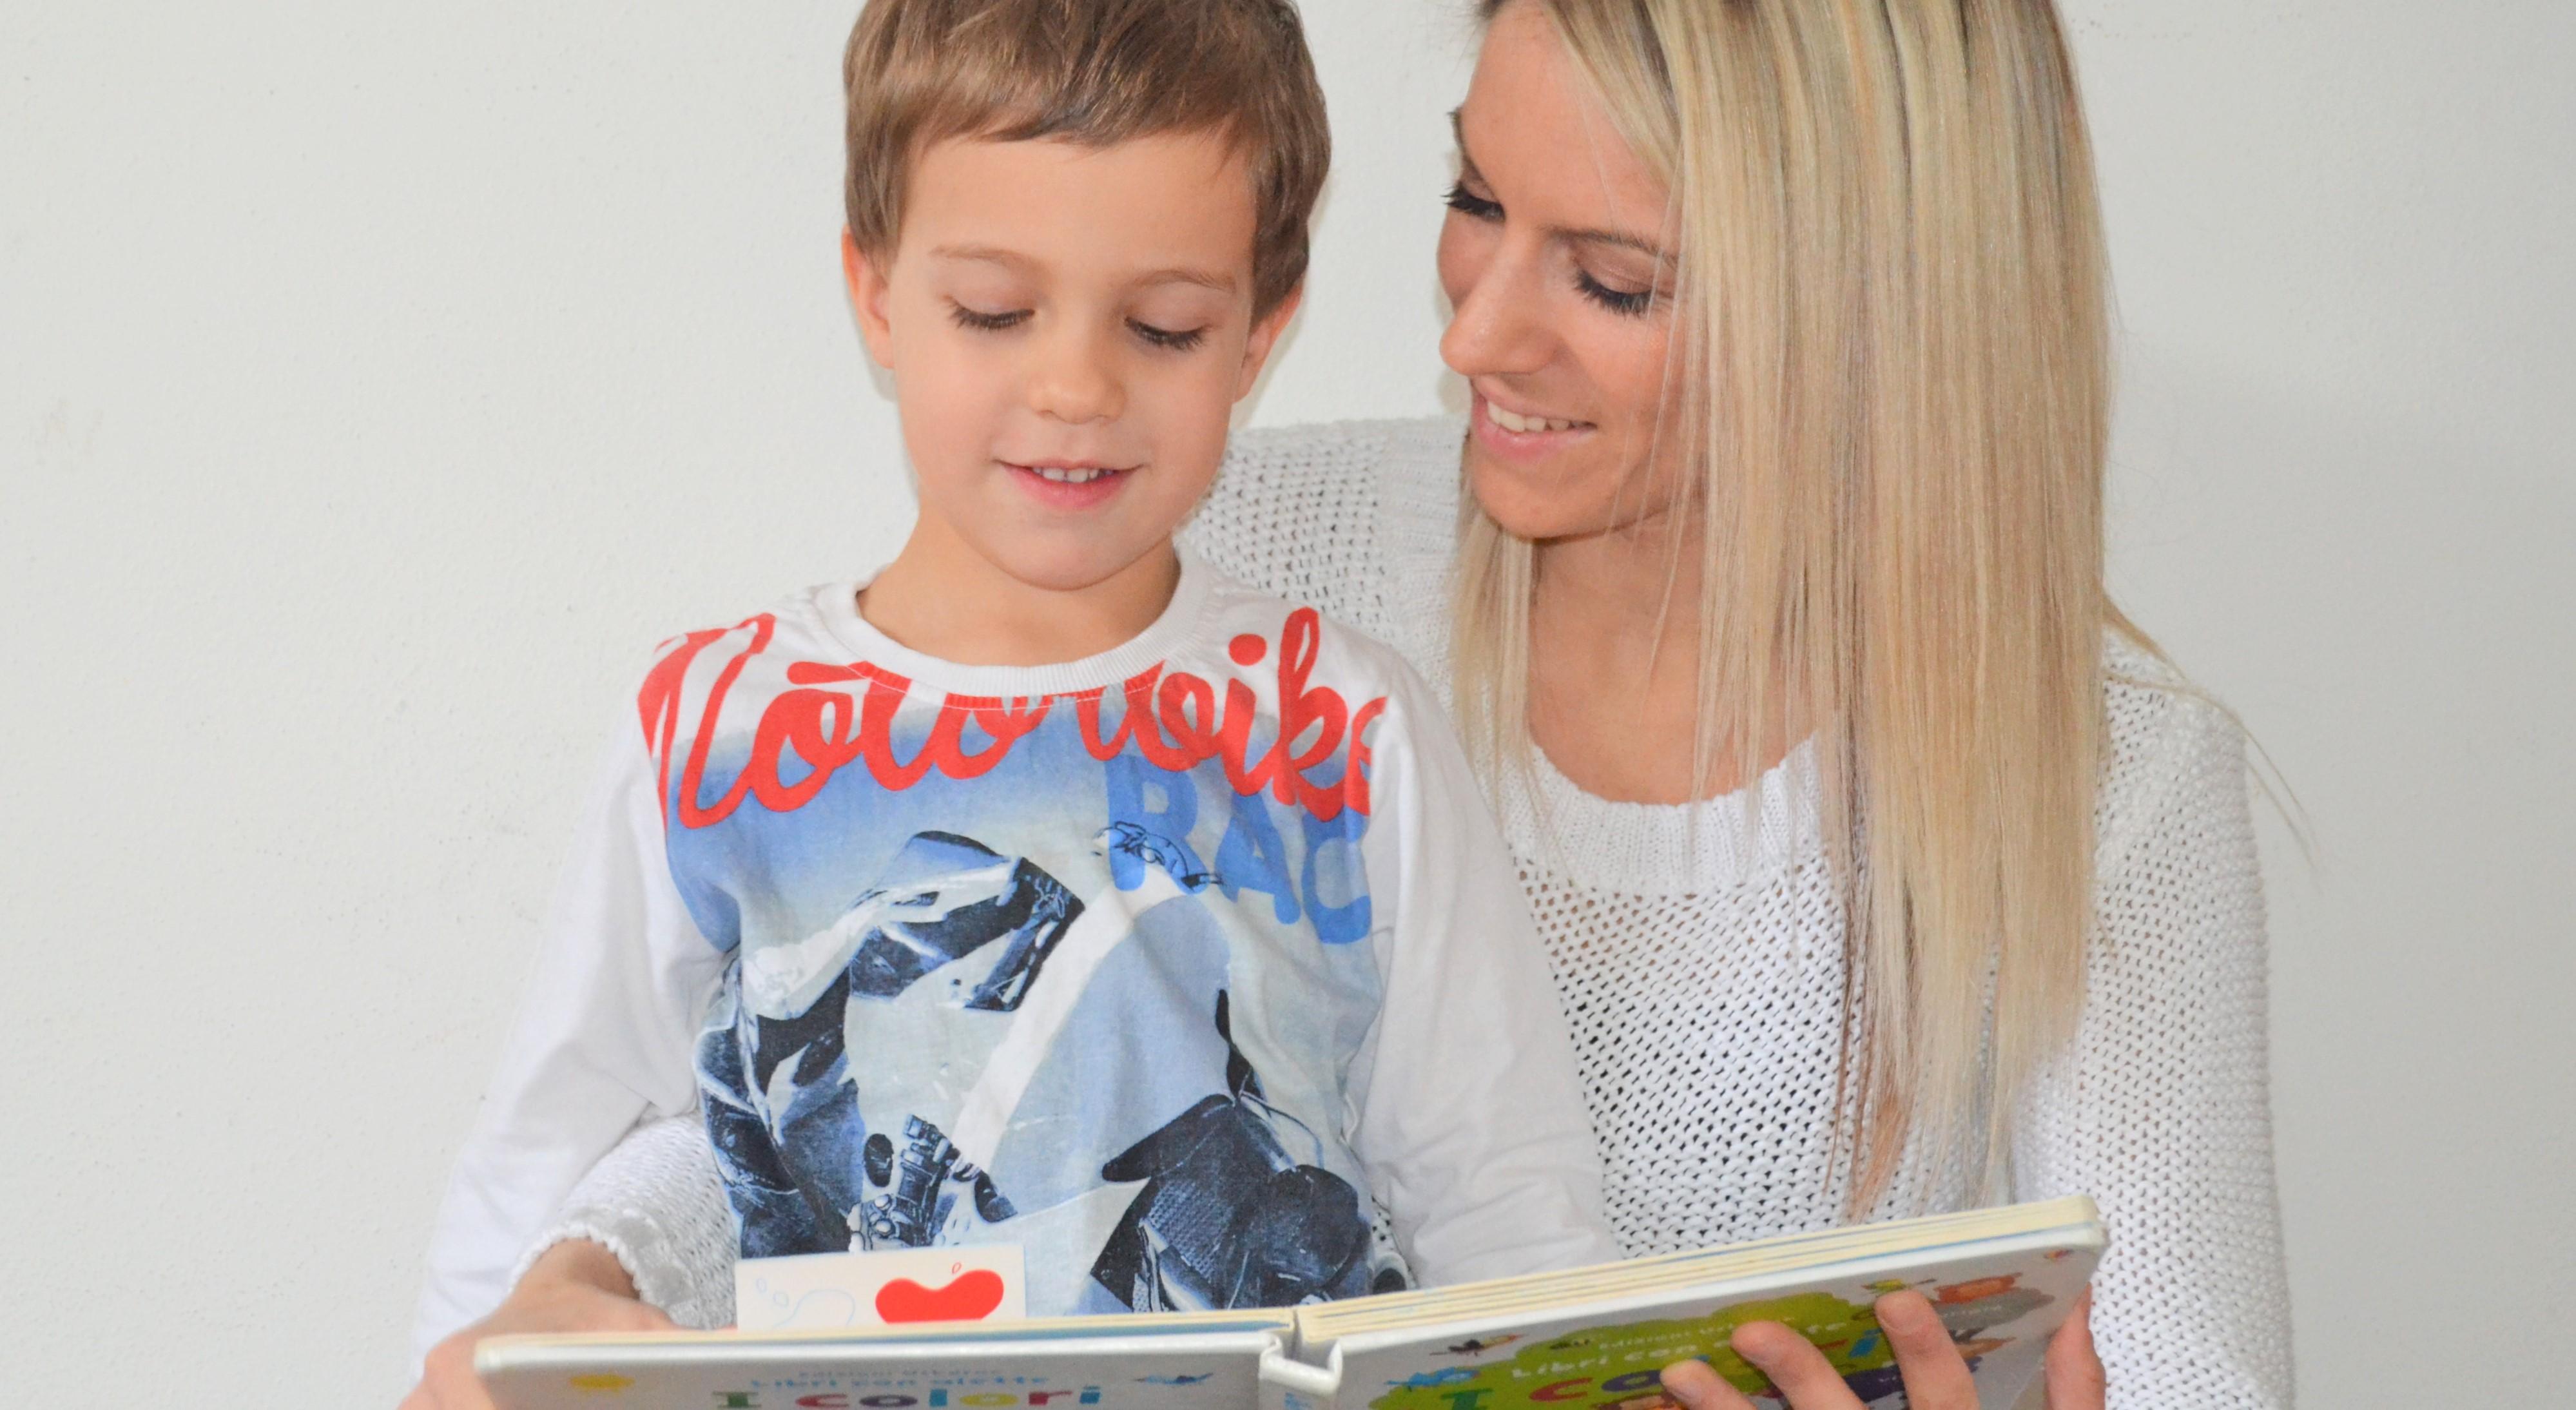 Easy Ways to Nurture your Child's Language Development from 0-6 years old